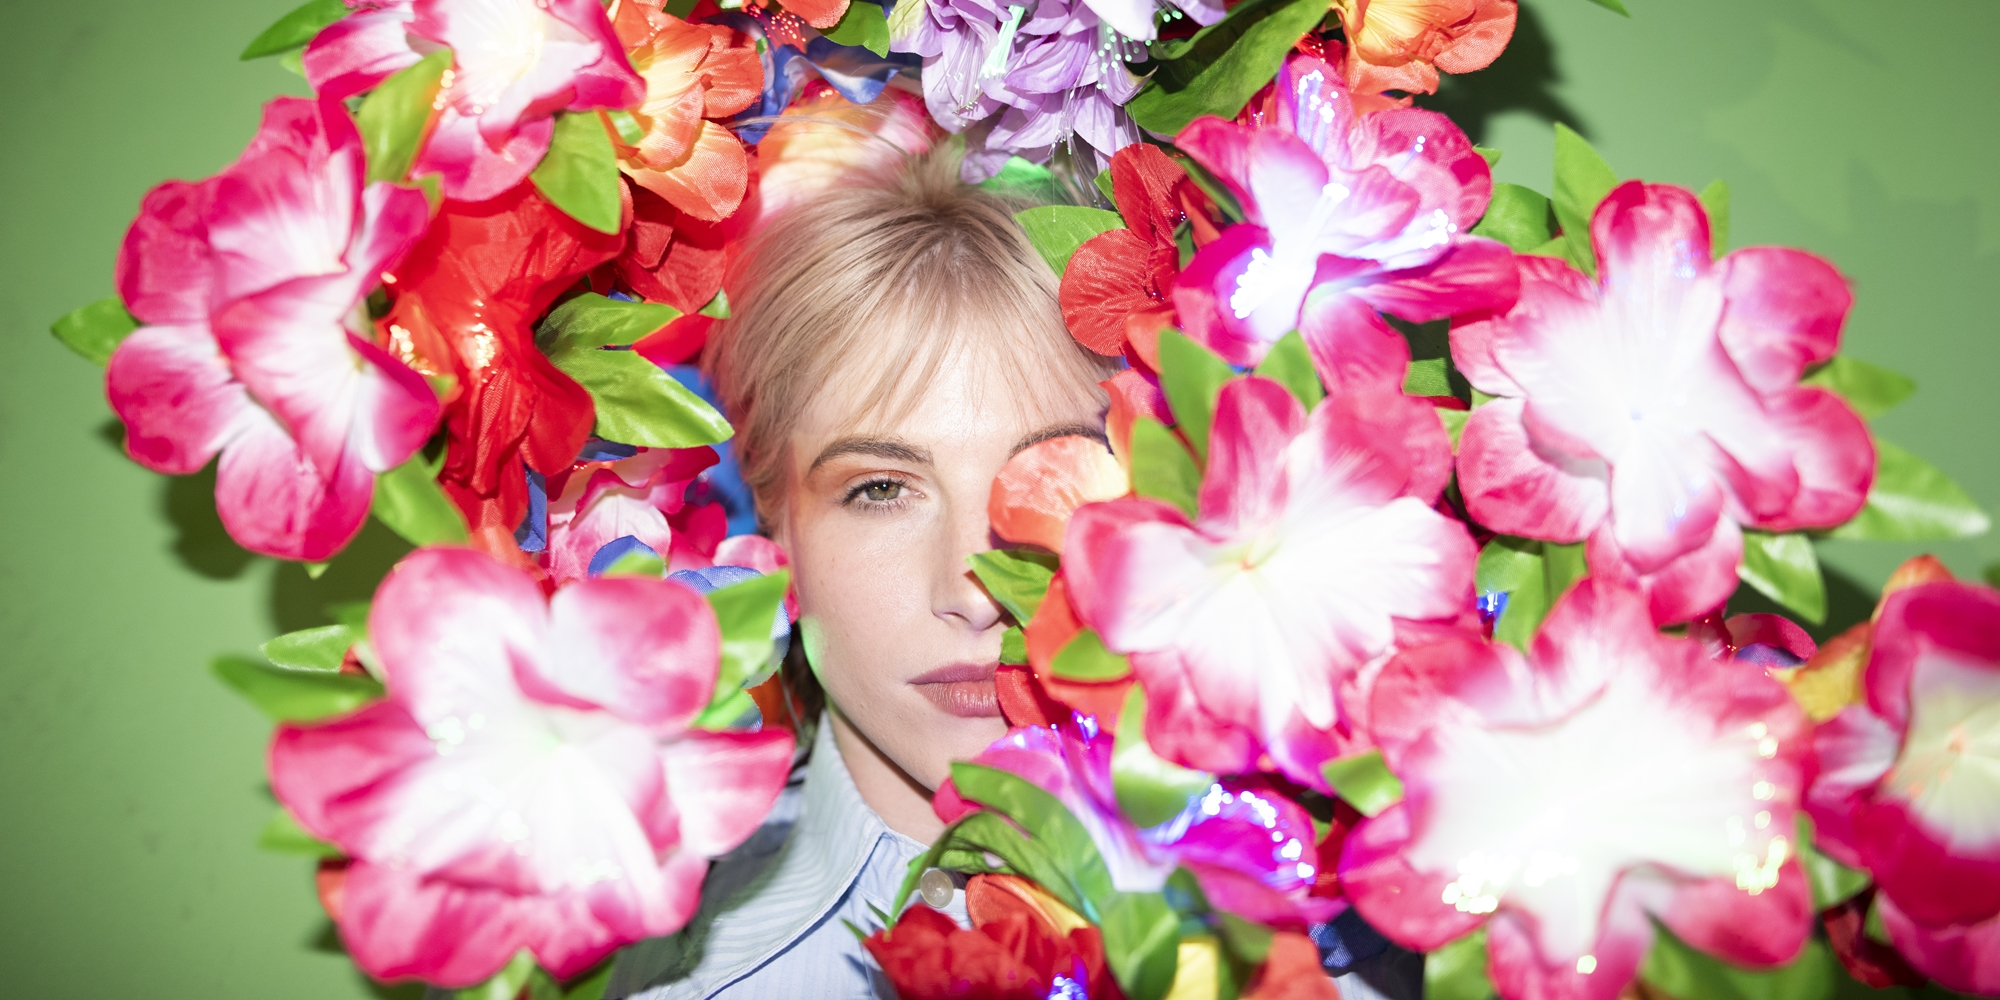 hayley williams release album petals for armor